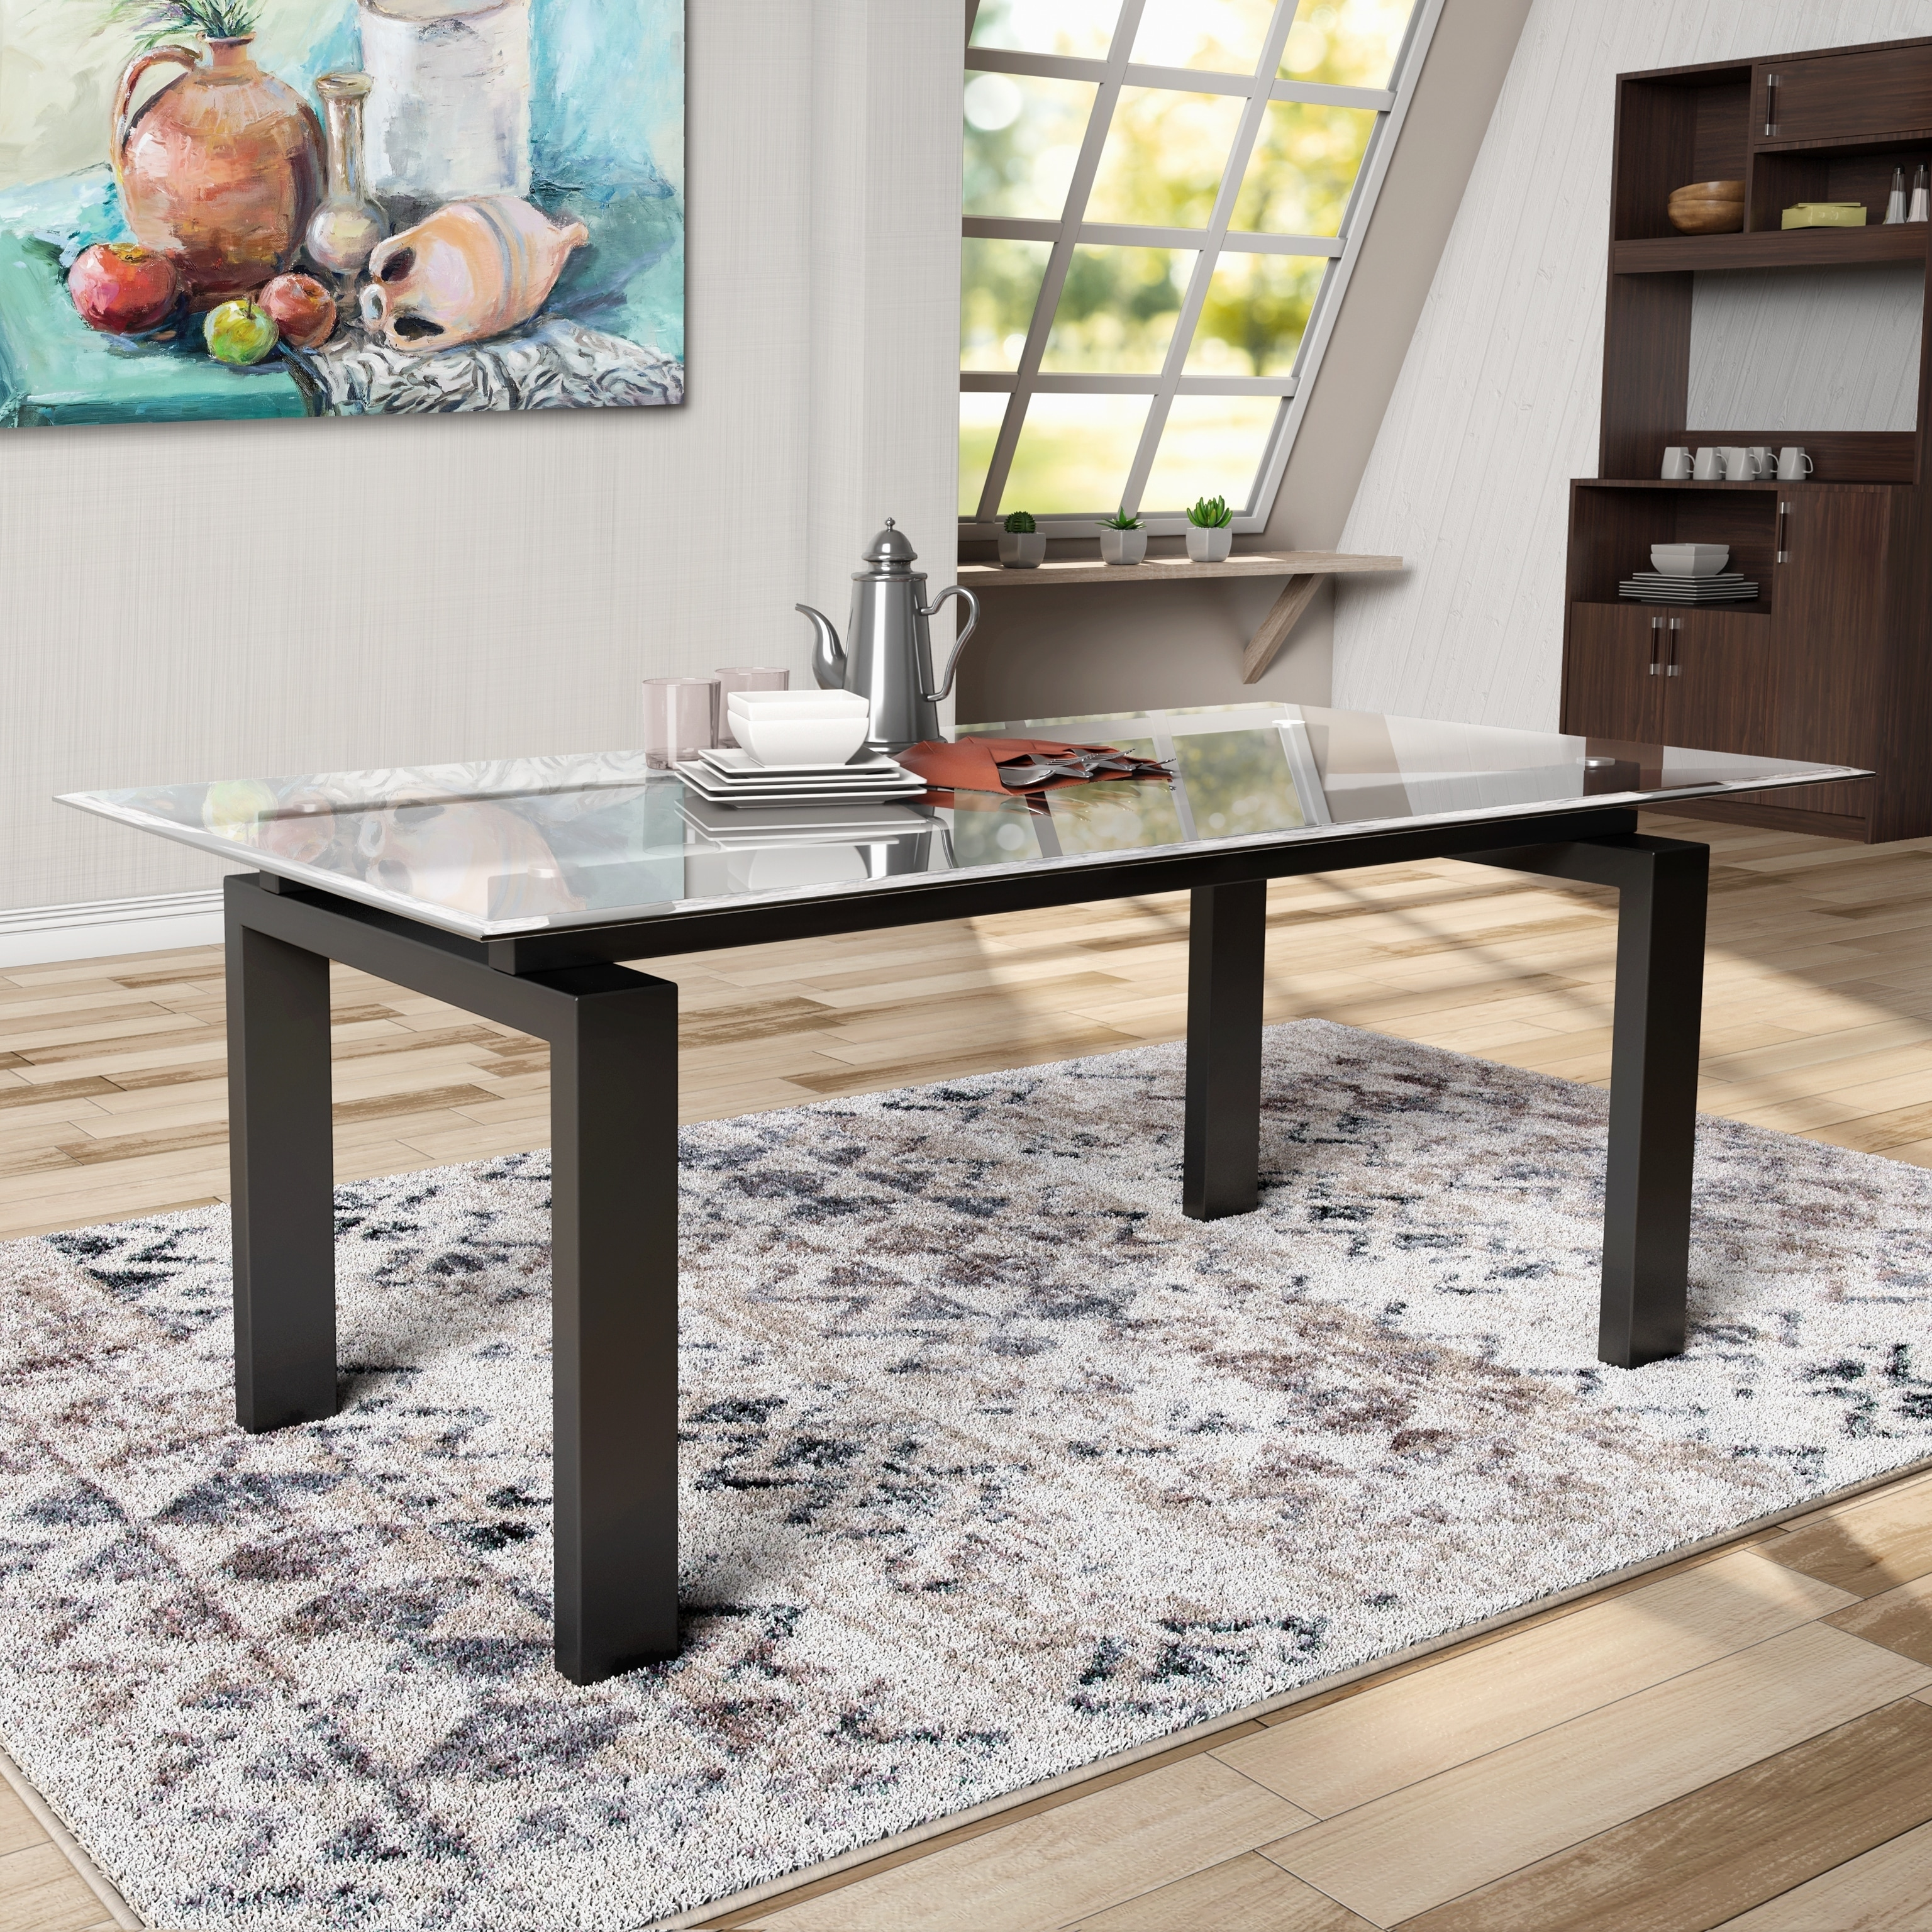 Furniture Of America Serafin Contemporary Glass Top Dark Walnut - Dark walnut dining table and chairs